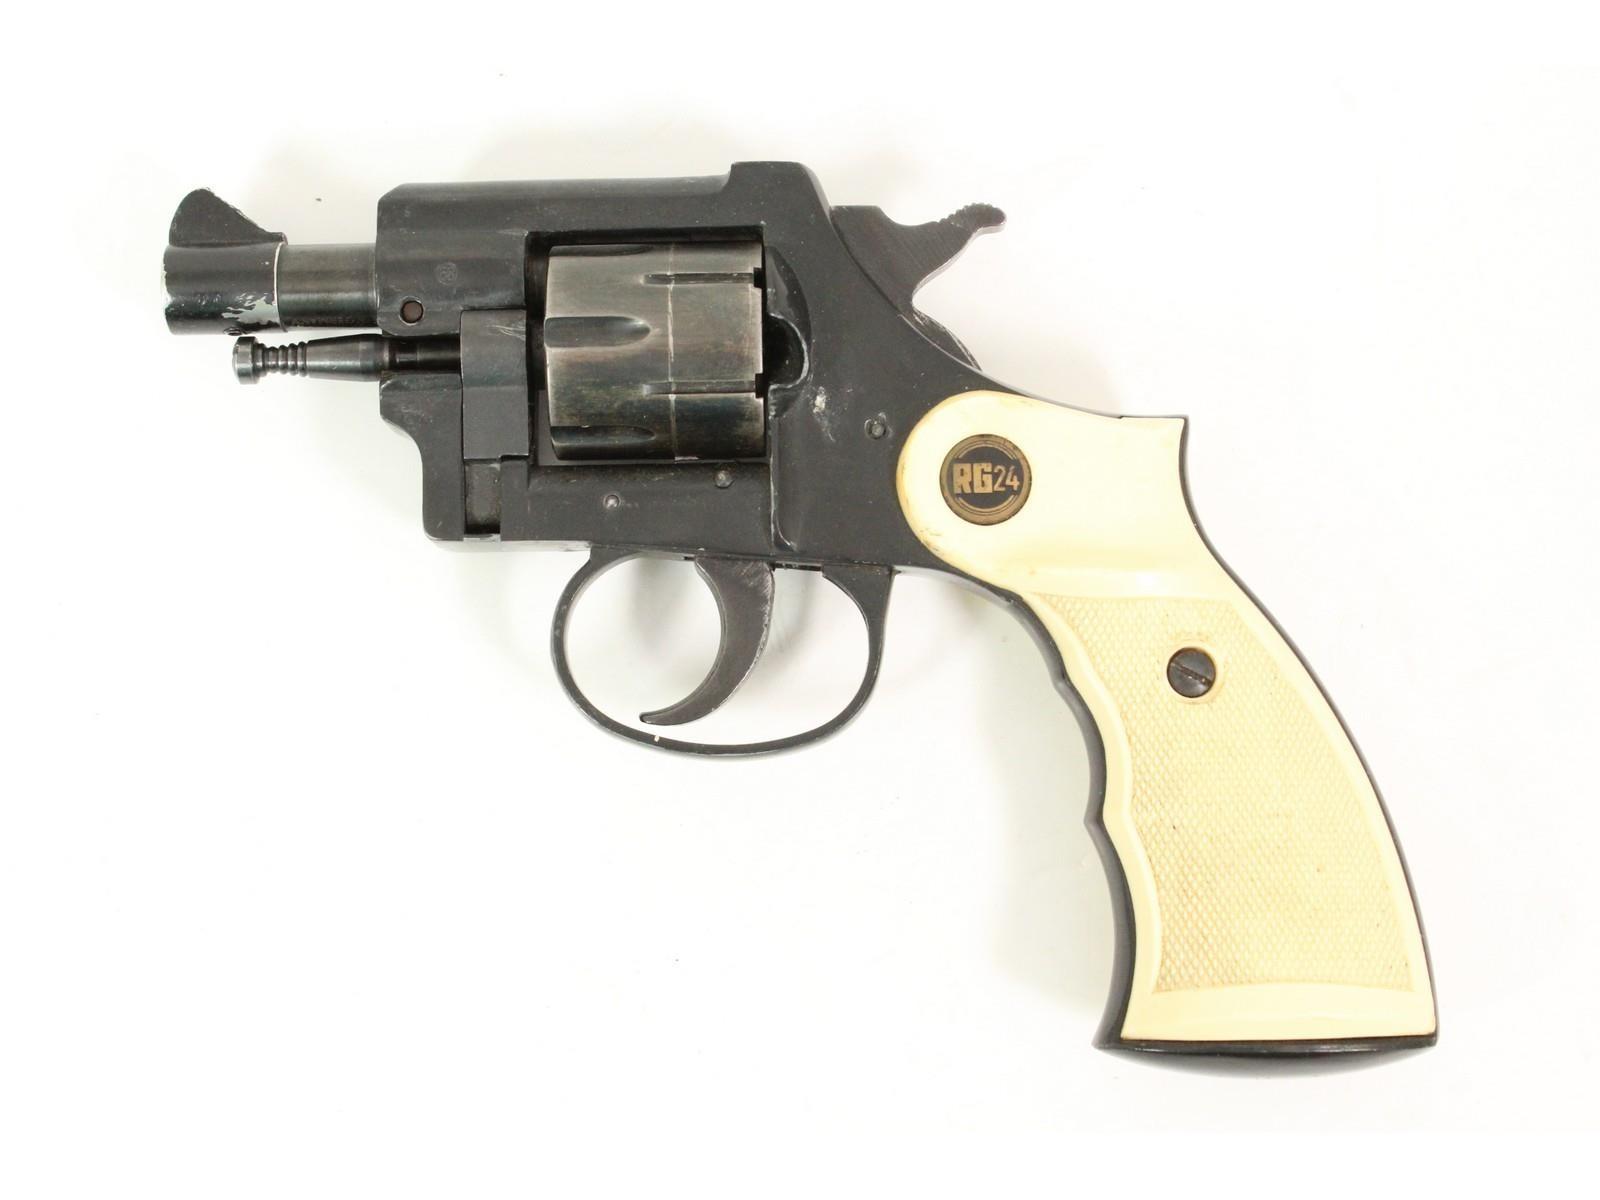 Rohm RG24 Revolver 22 Caliber | Donley Auction Services Inc